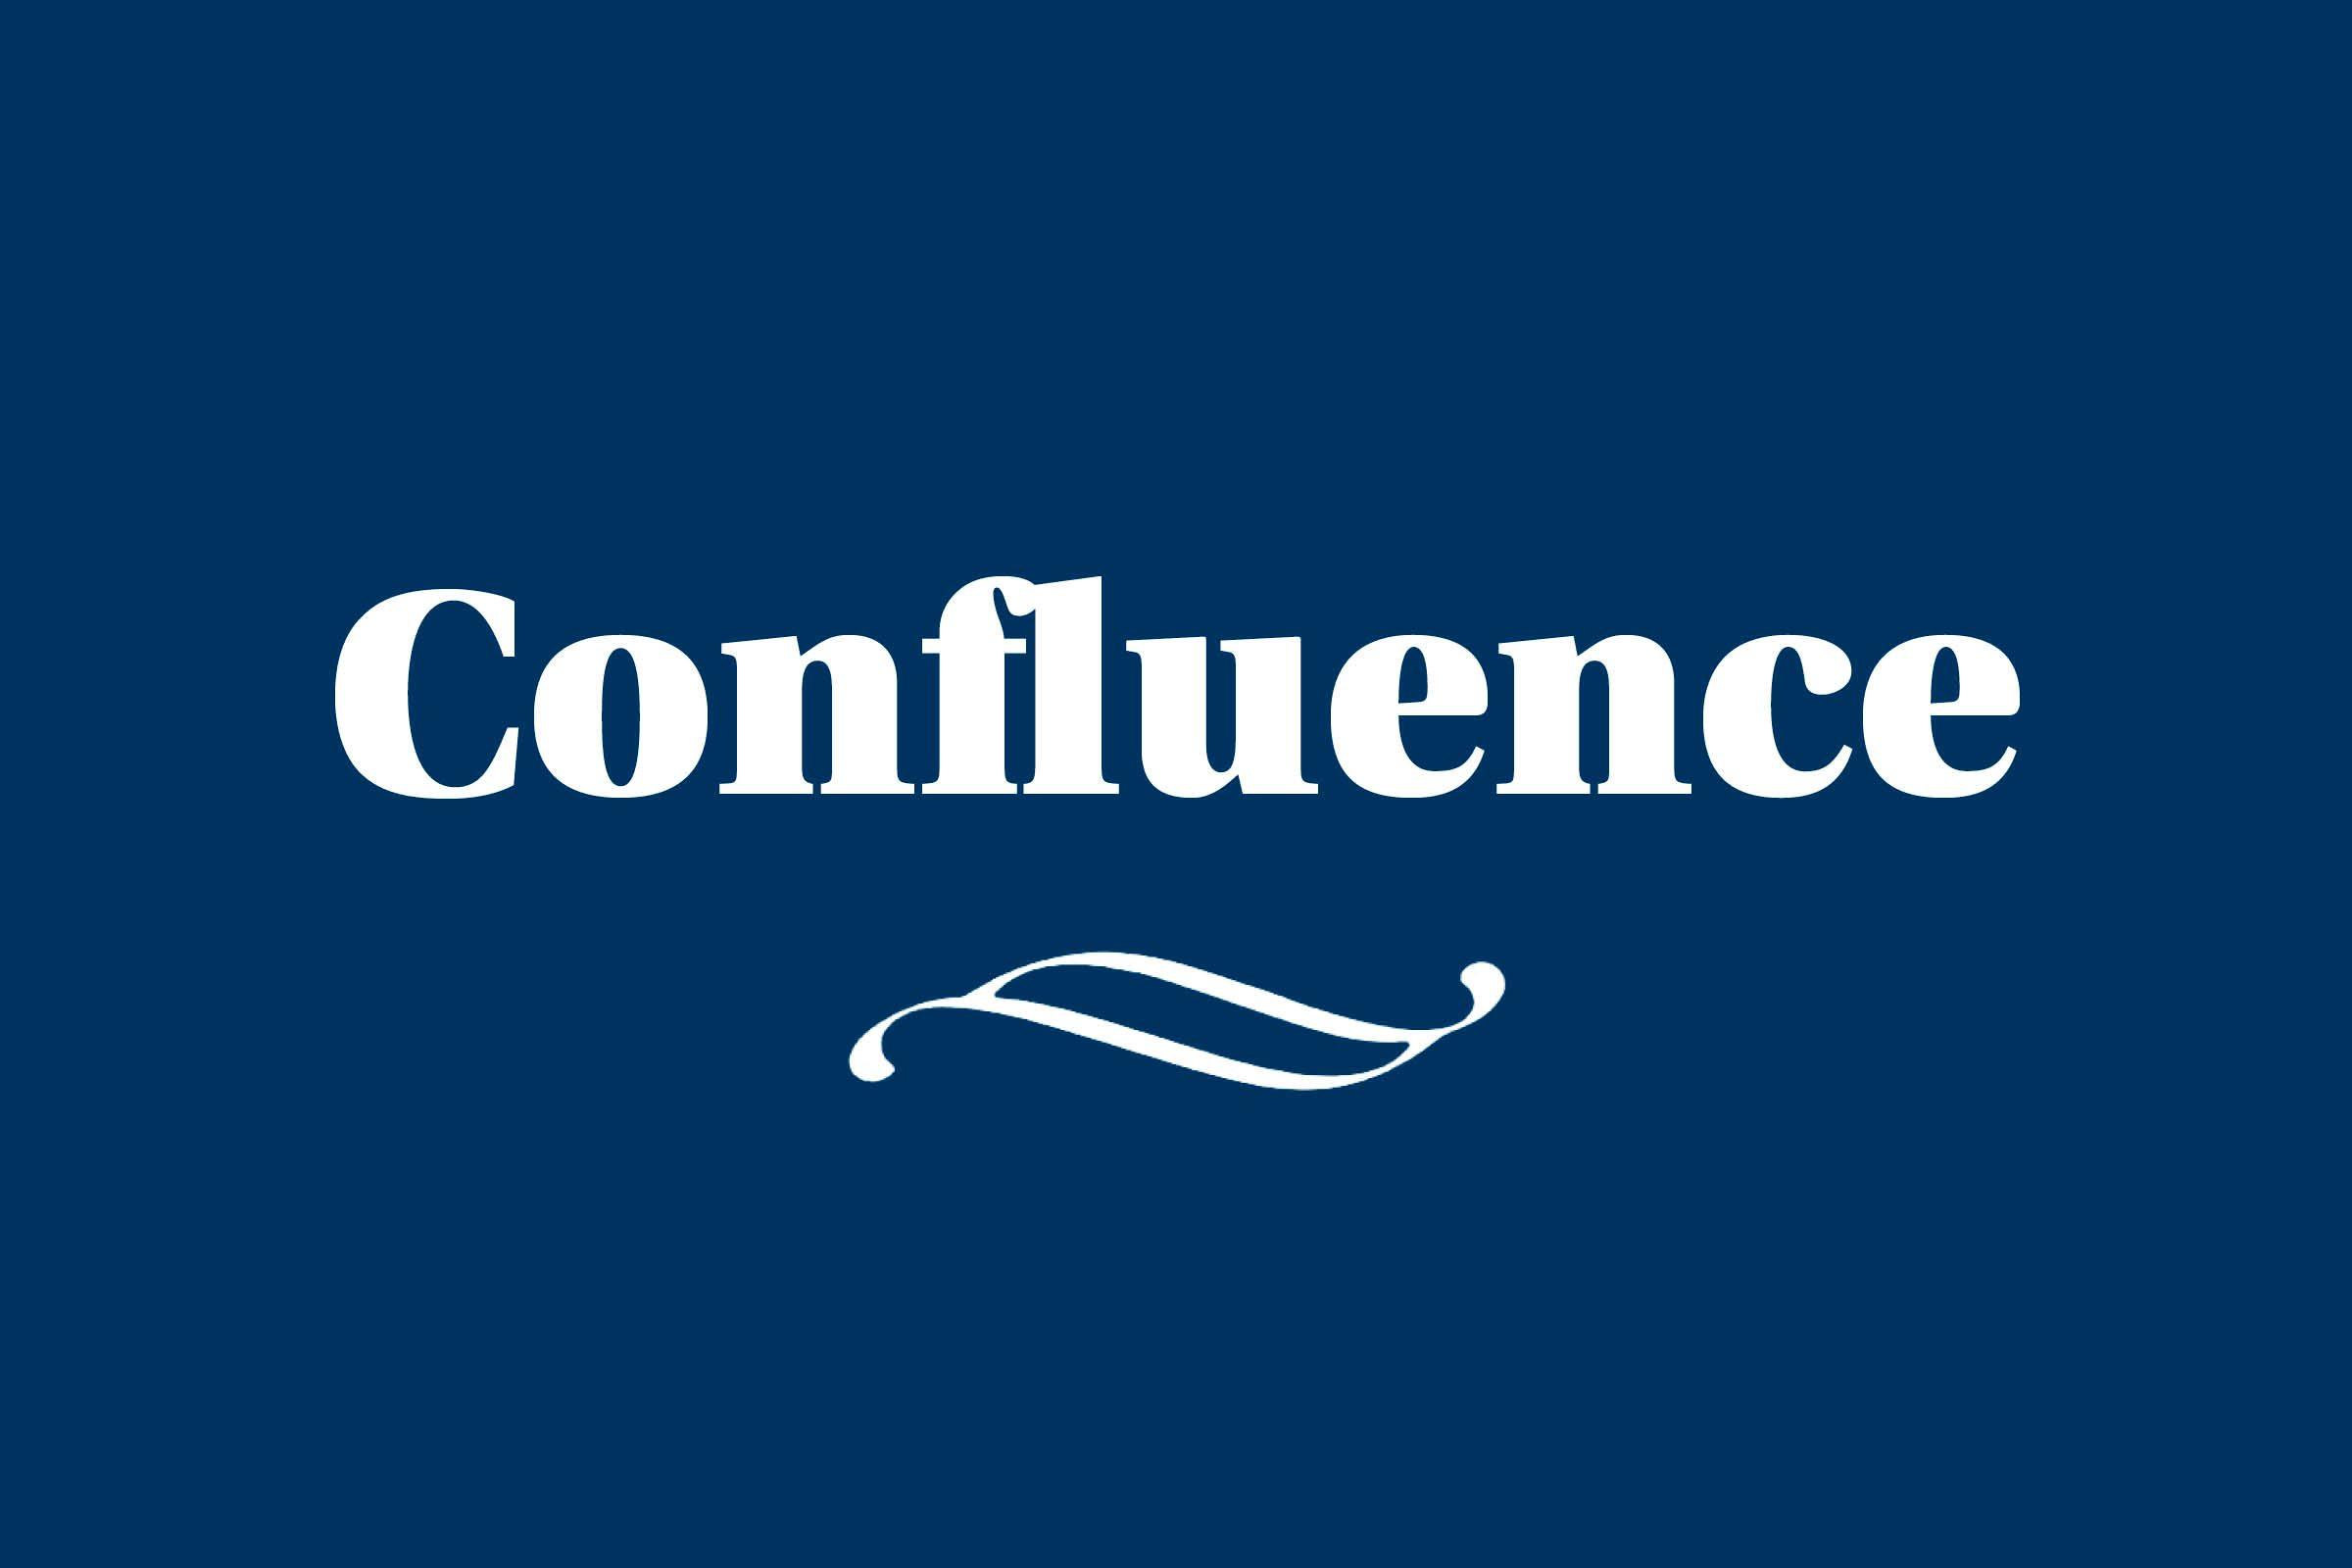 Confluence